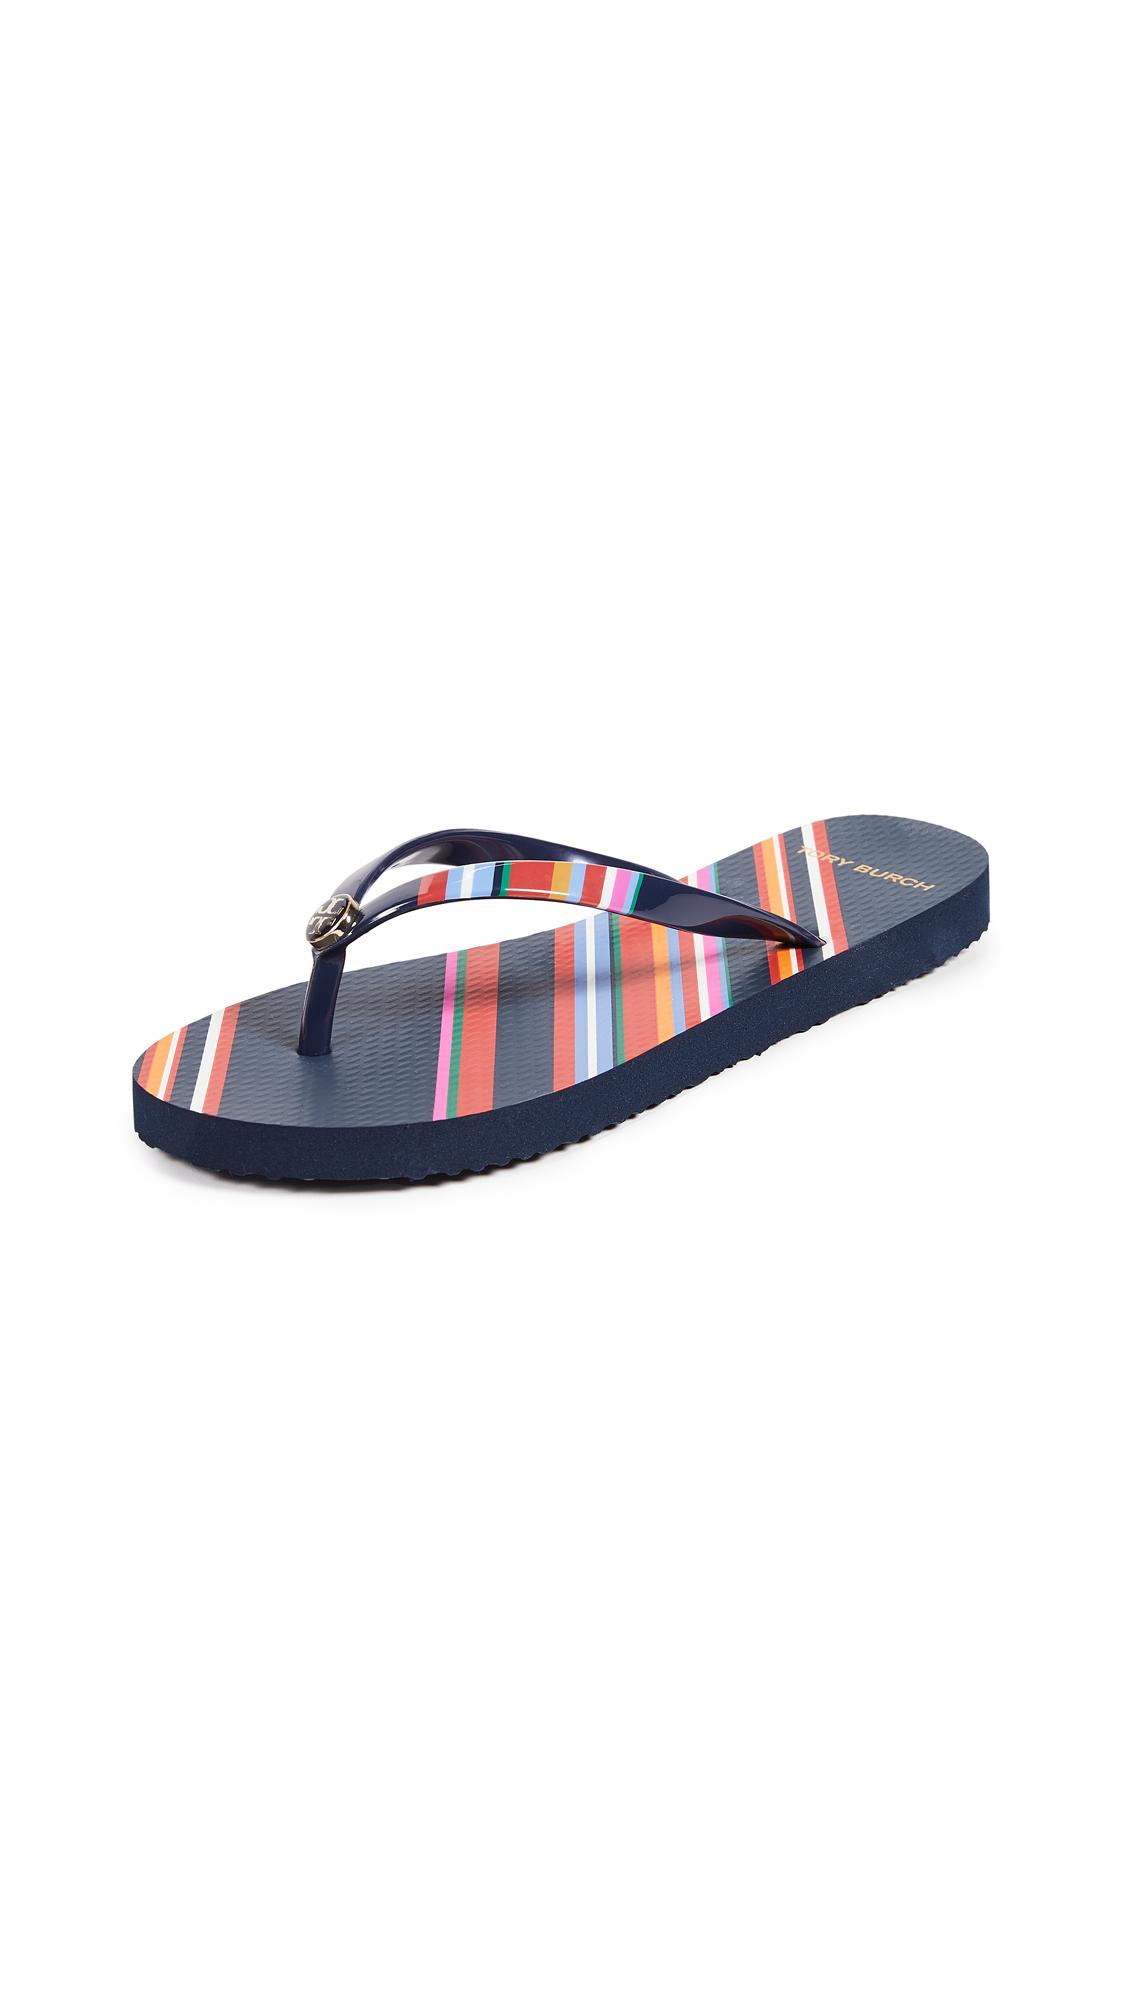 Tory Burch Printed Thin Flip Flops - Vivid Stripe